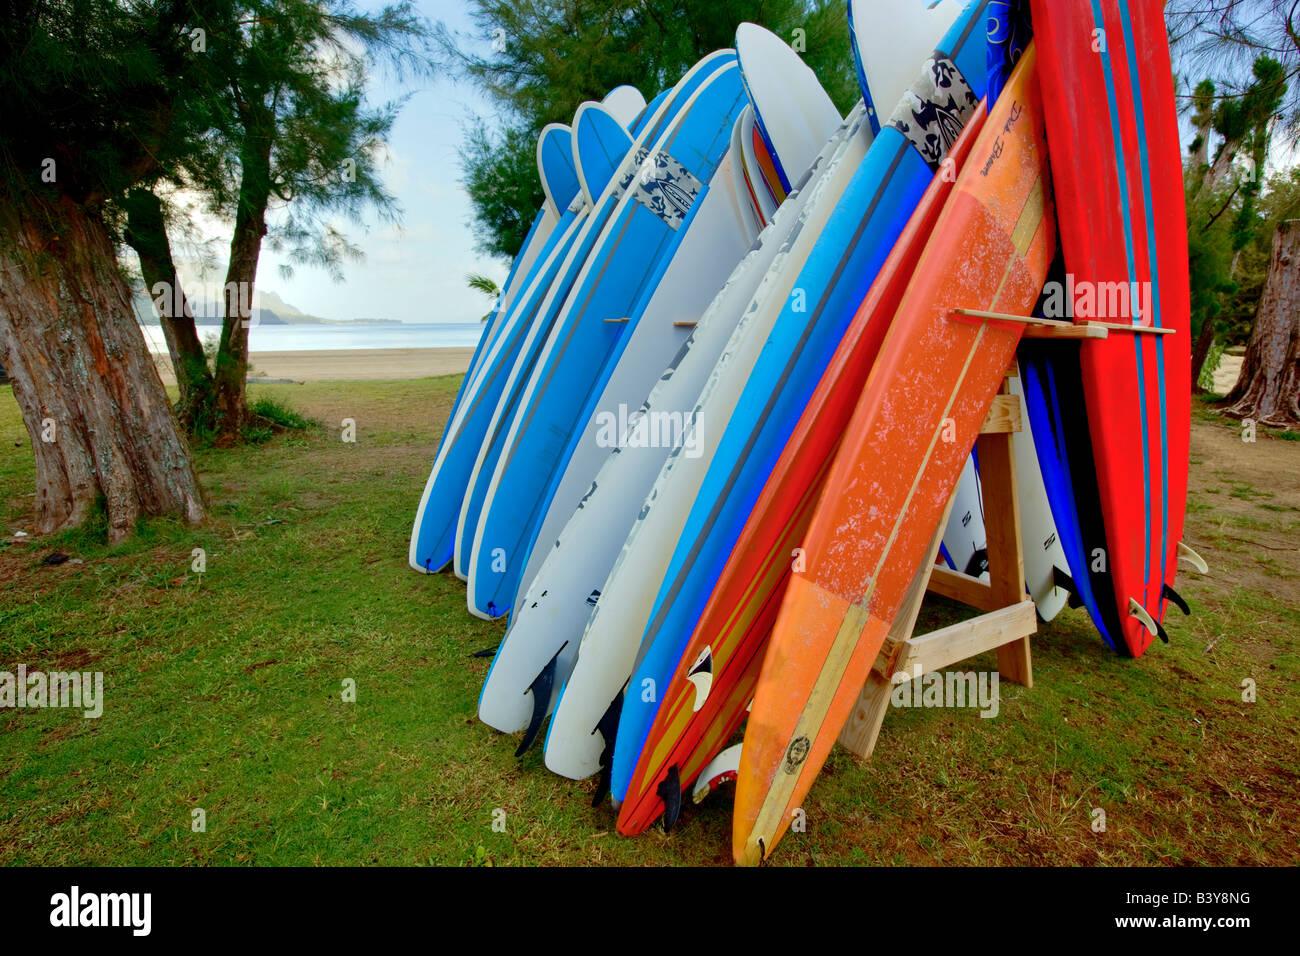 Stcked surfboards Hanalei Bay Kauai Hawaii - Stock Image